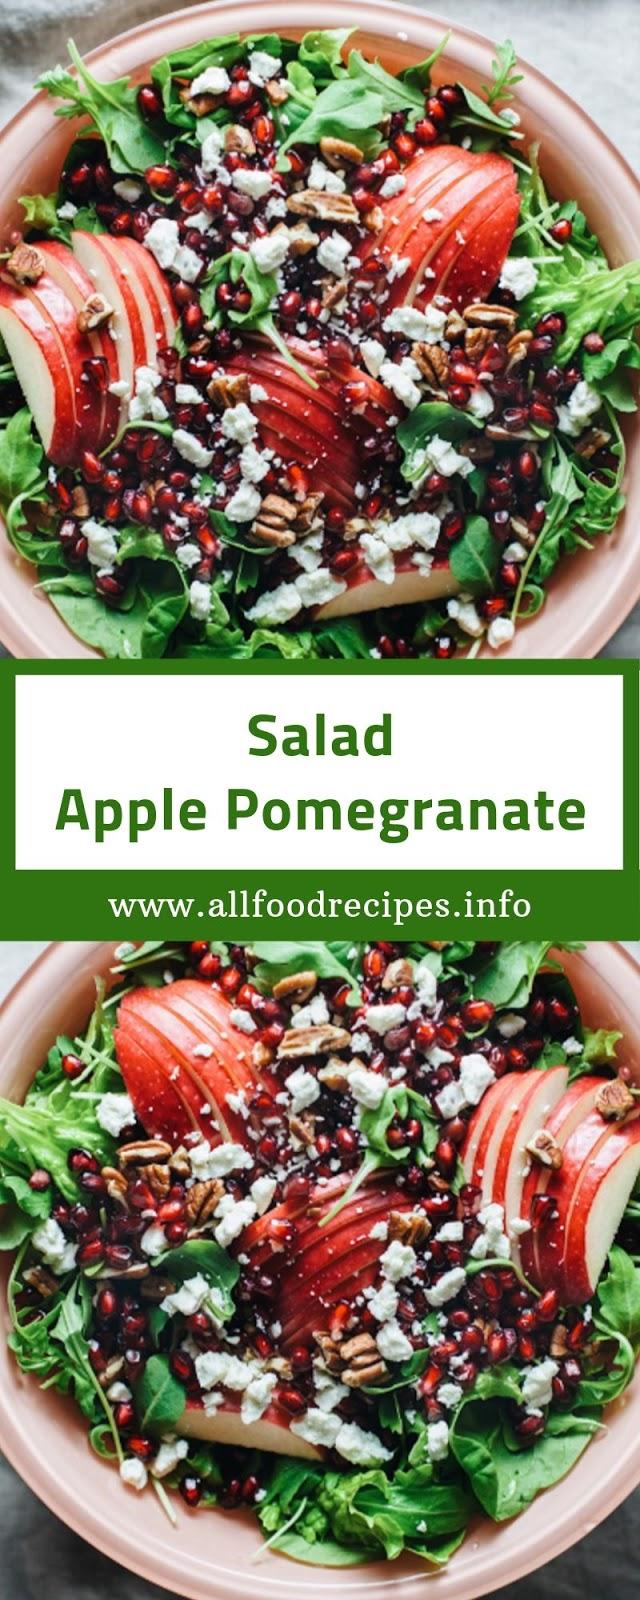 Salad Apple Pomegranate